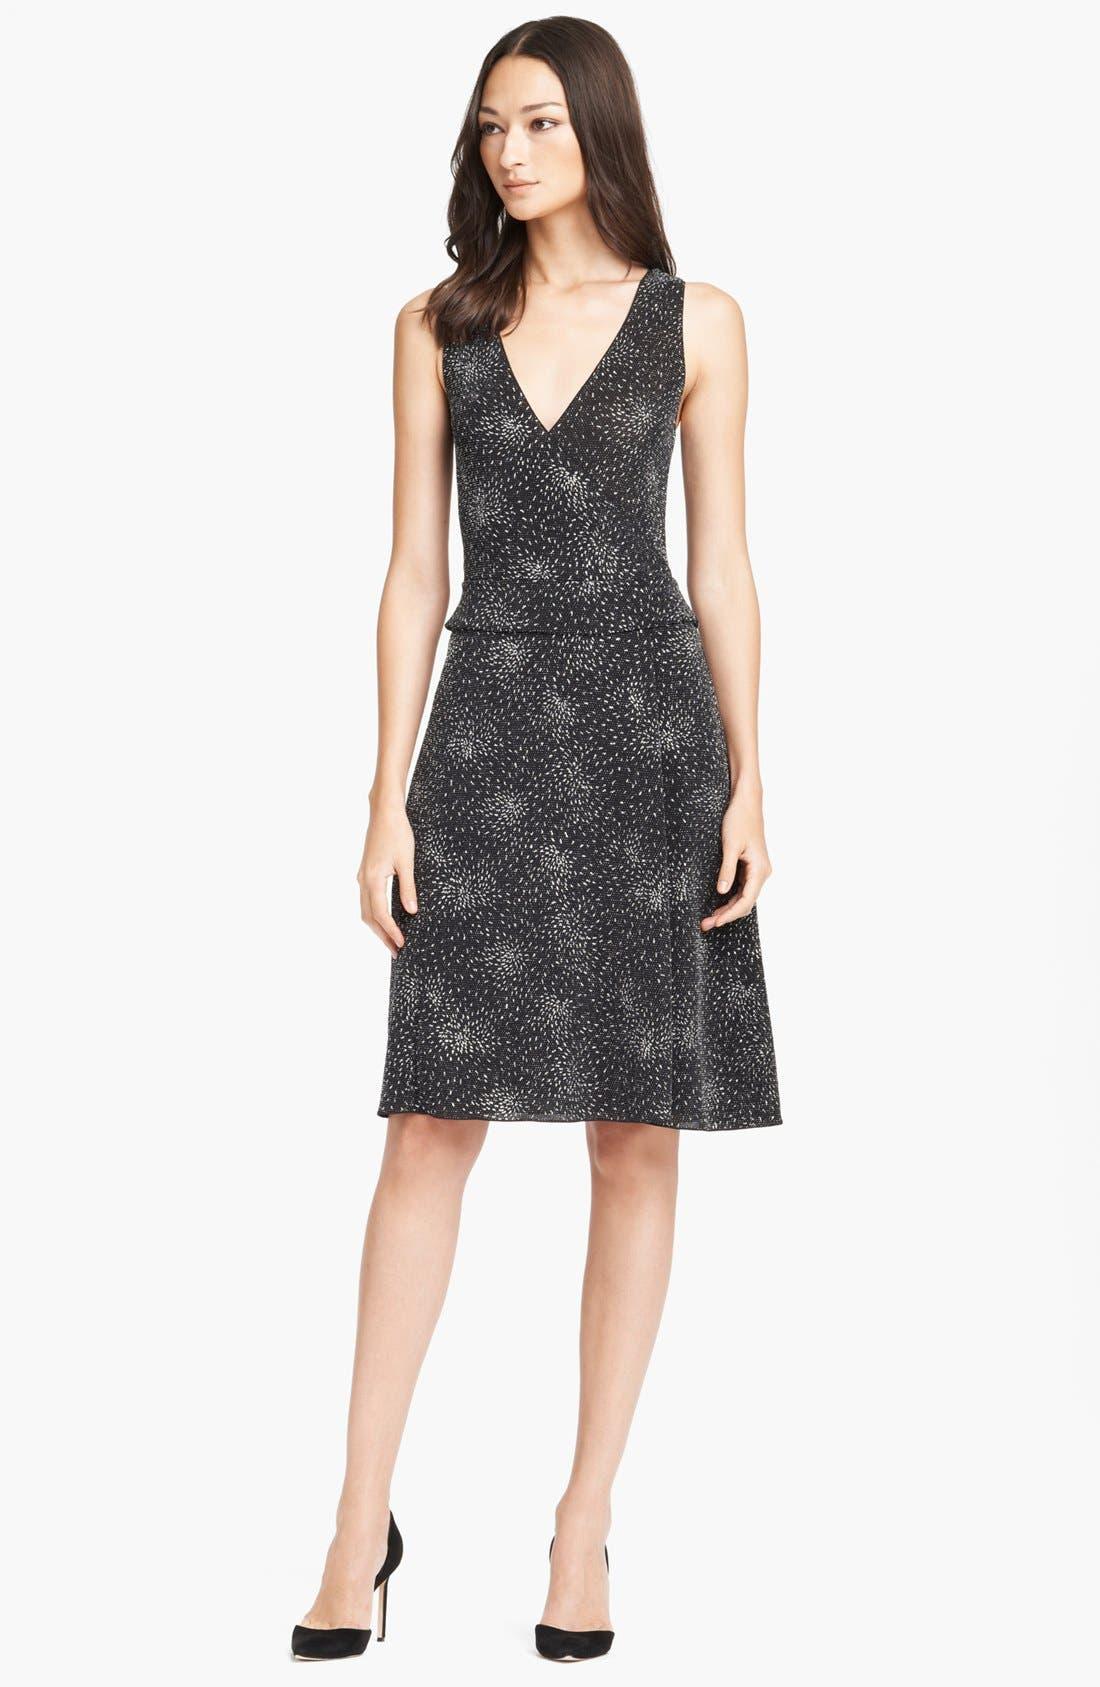 Alternate Image 1 Selected - Armani Collezioni Full Skirt Knit Dress